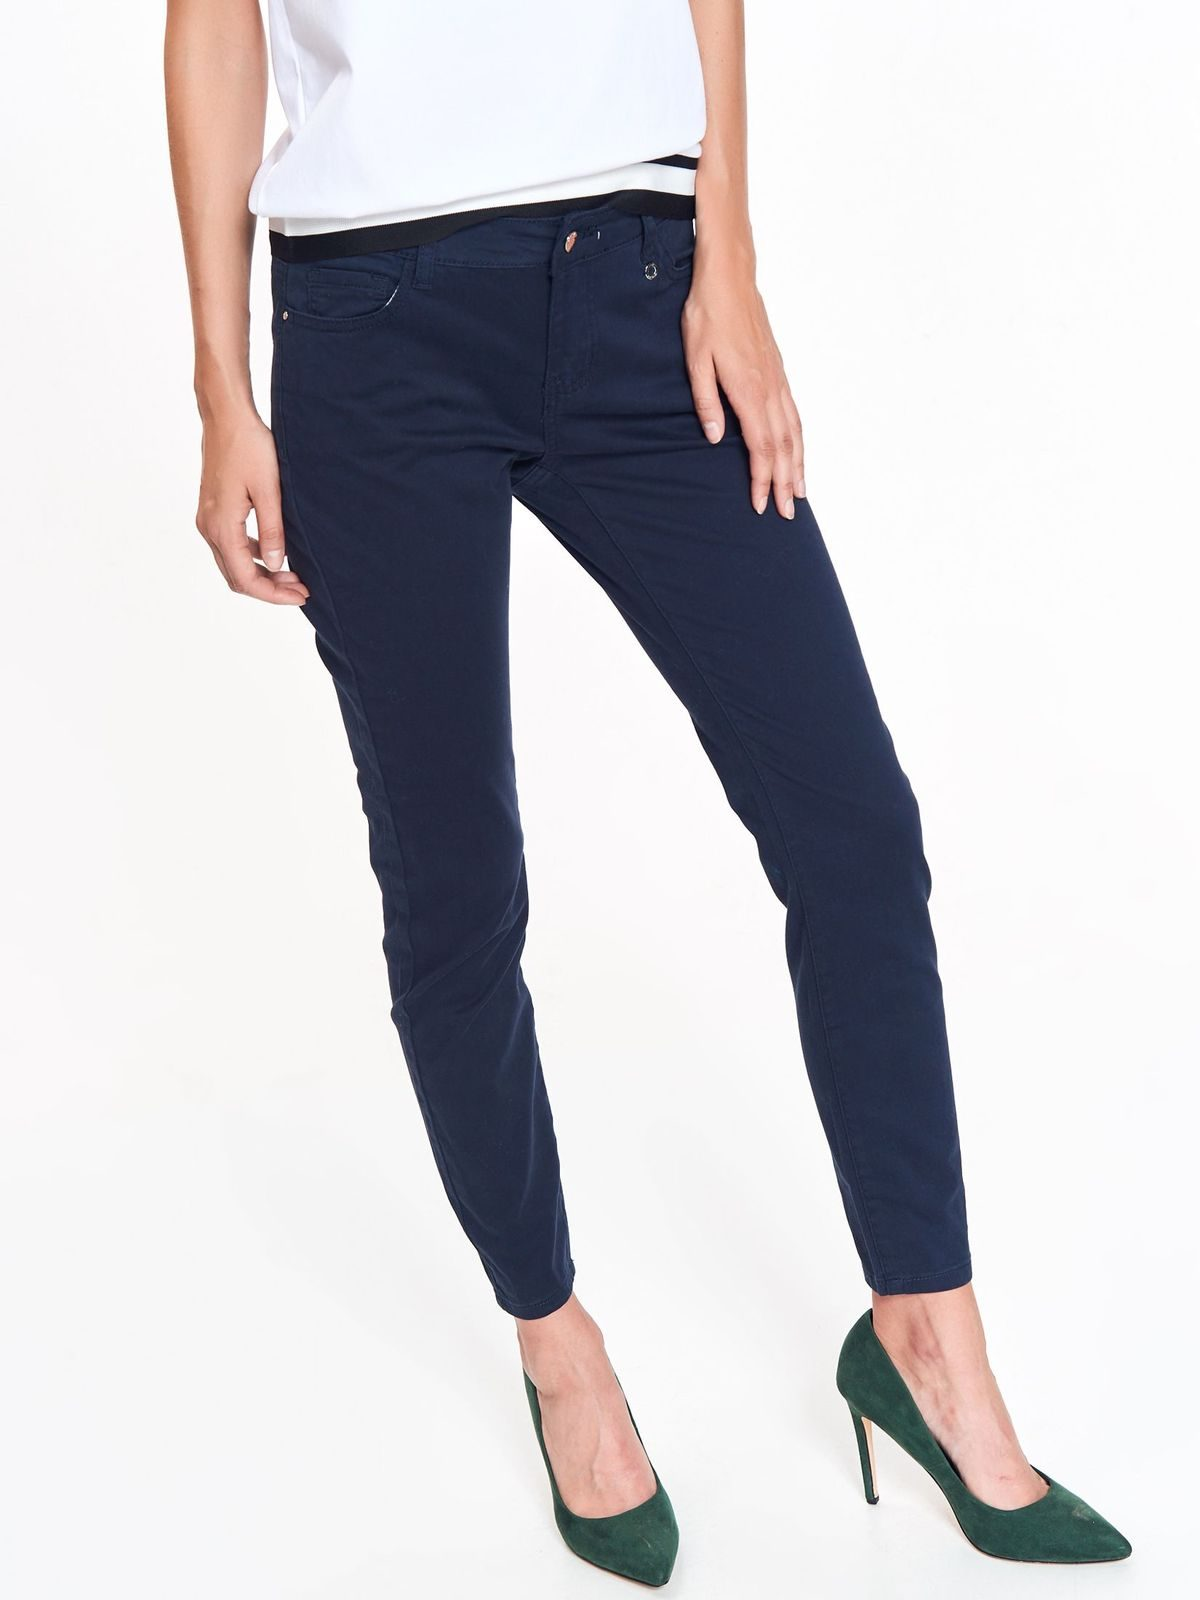 faf3319dd0ac Modré bavlnené nohavice